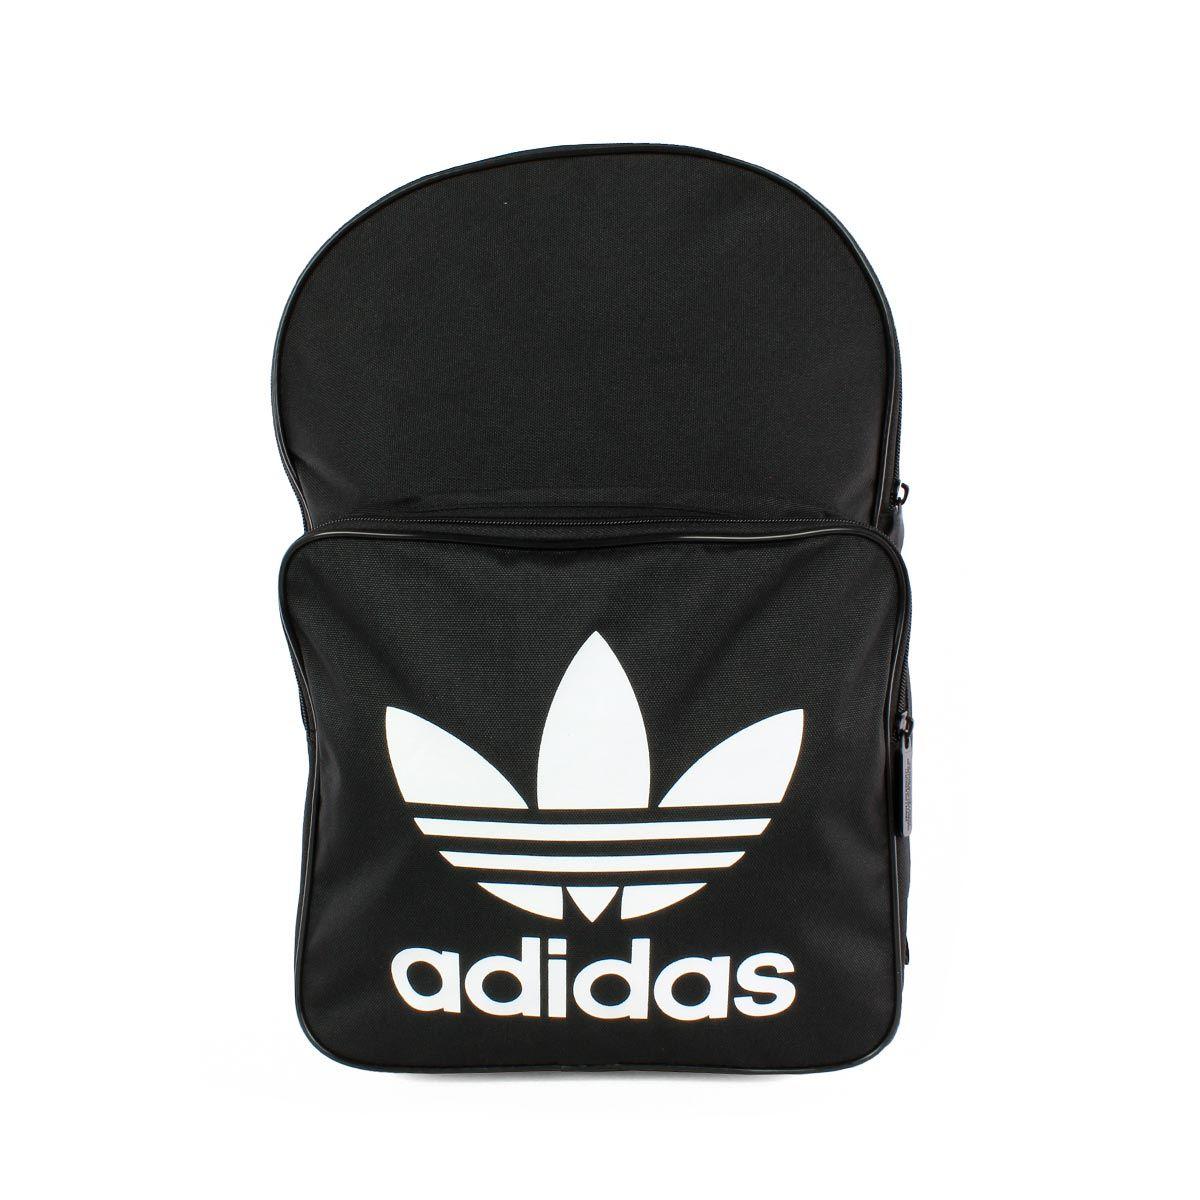 459ab291c3 Adidas Classic Trefoil Backpack μαύρο.  sneakerstown  adidas   adidasoriginals  adidasclassic  classic